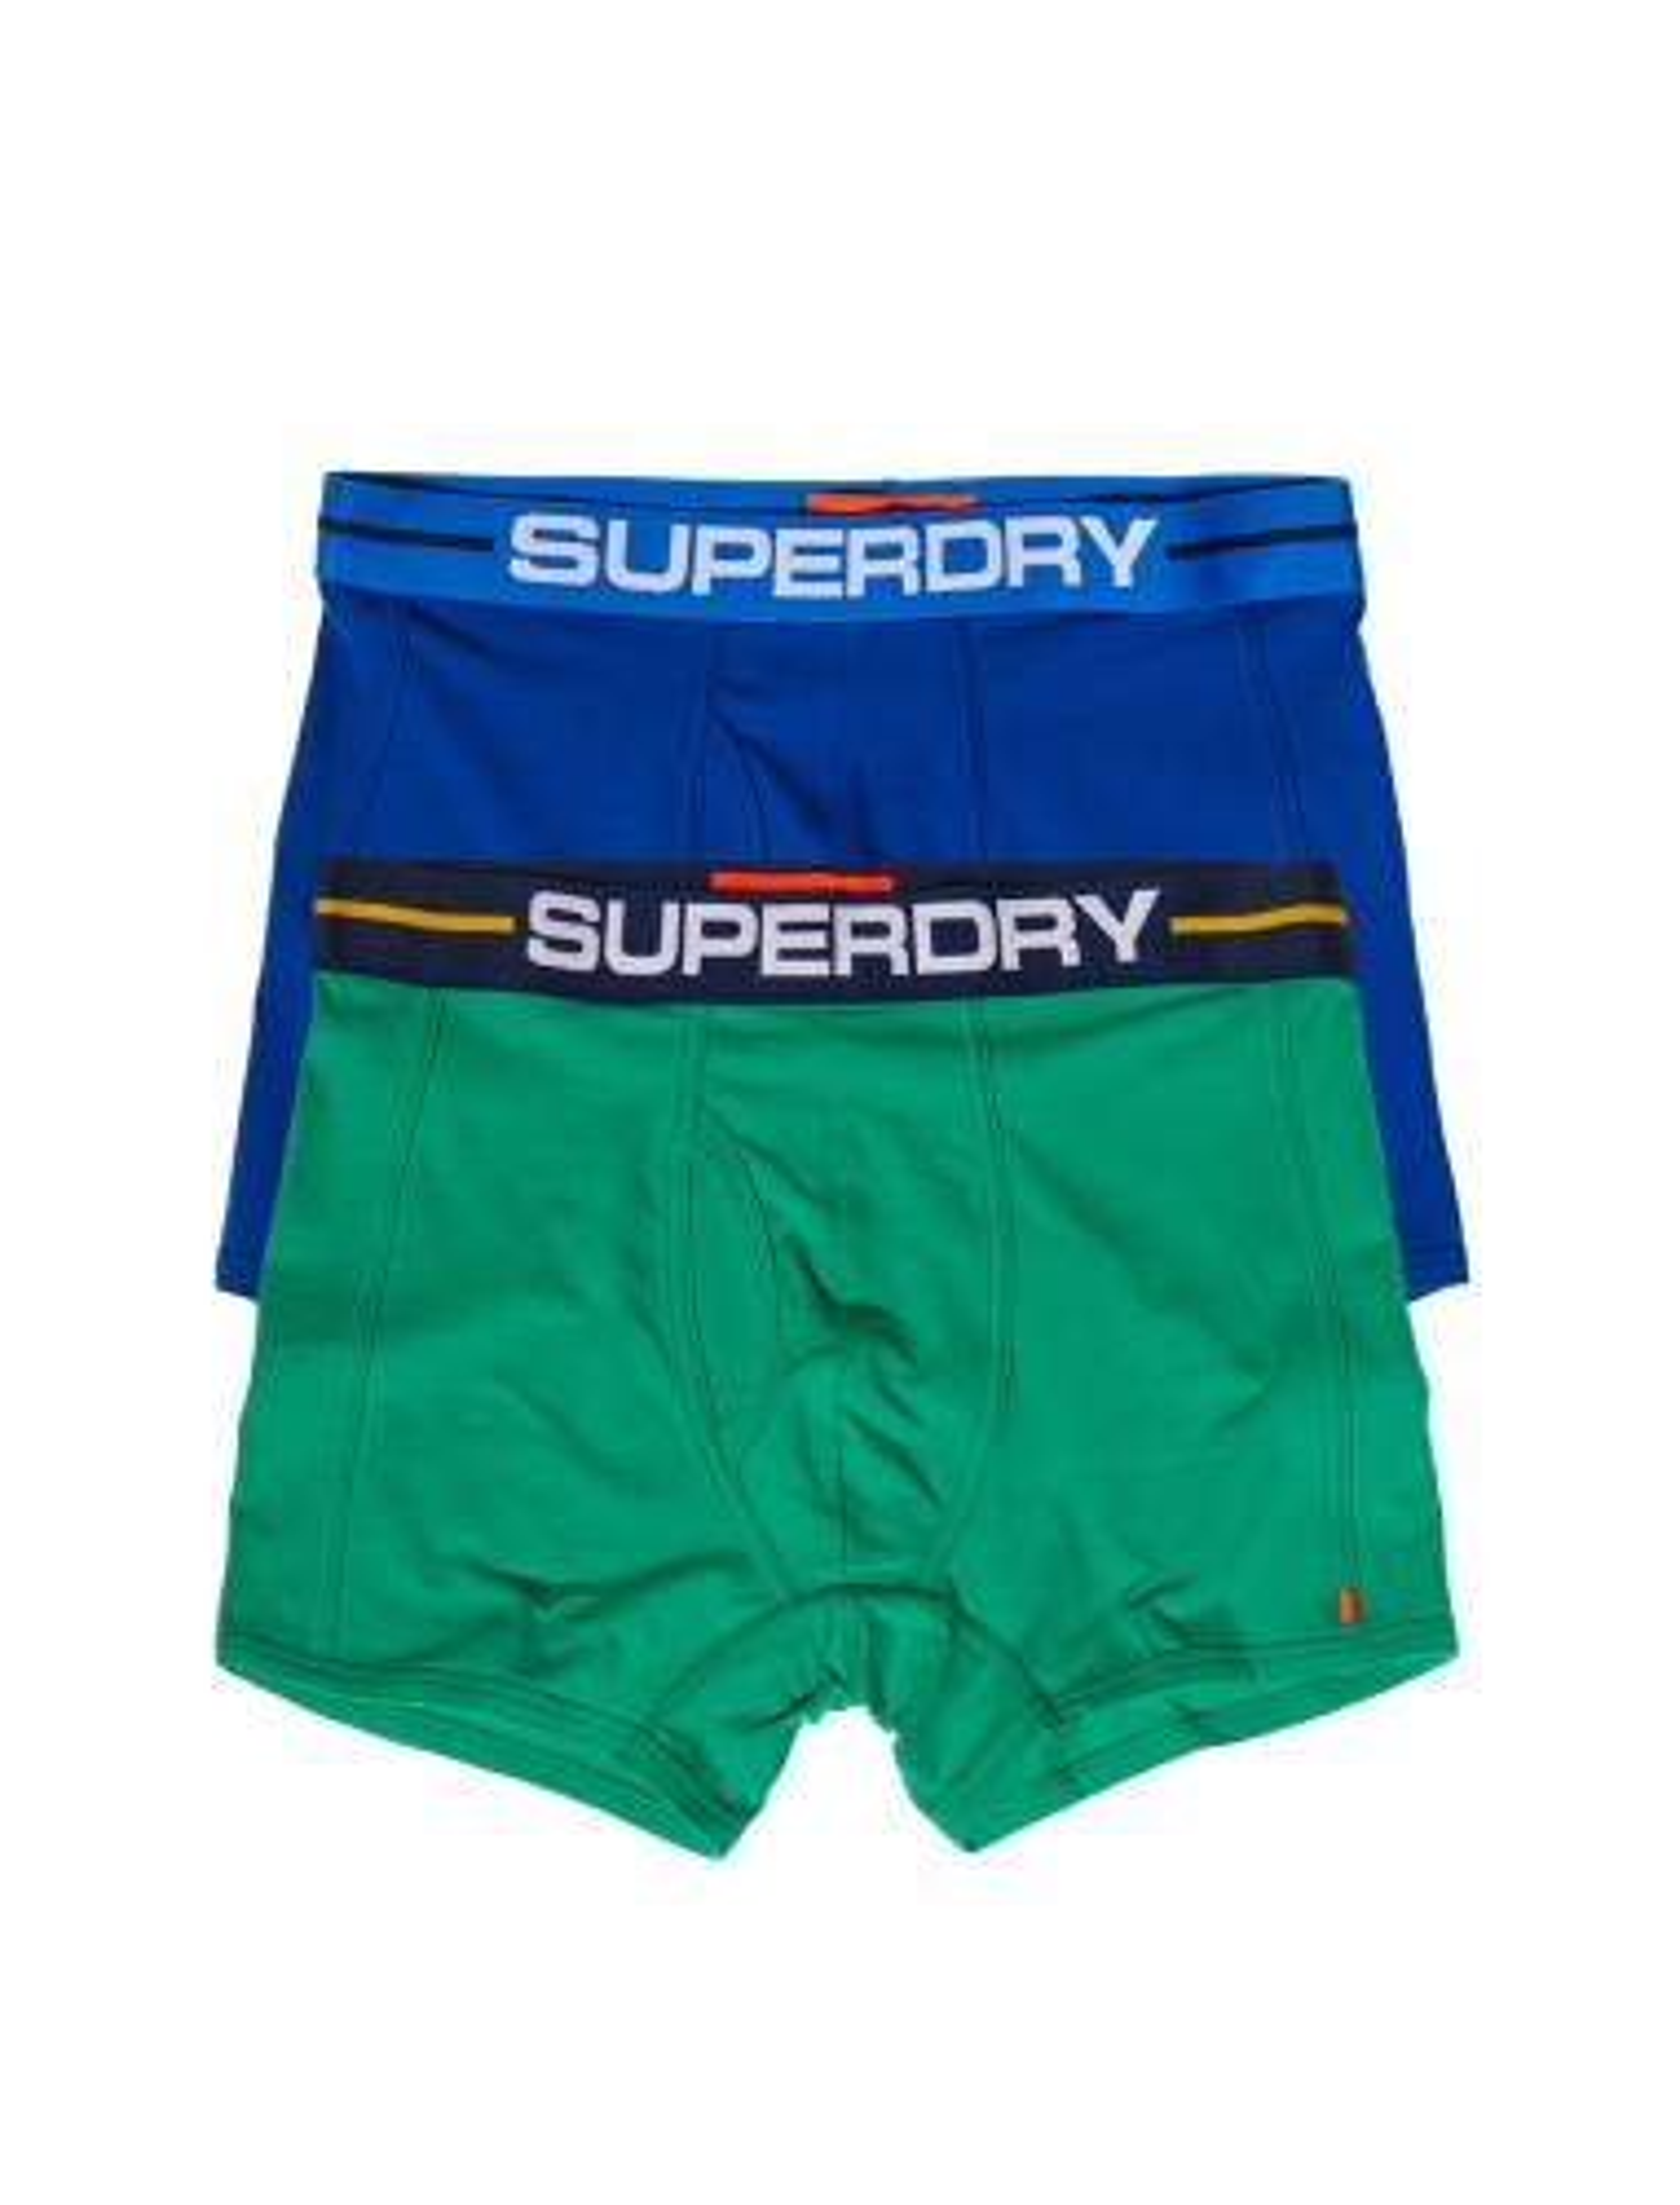 Men Cotton Boxer Underwear Pack Of 2 - سوپردرای